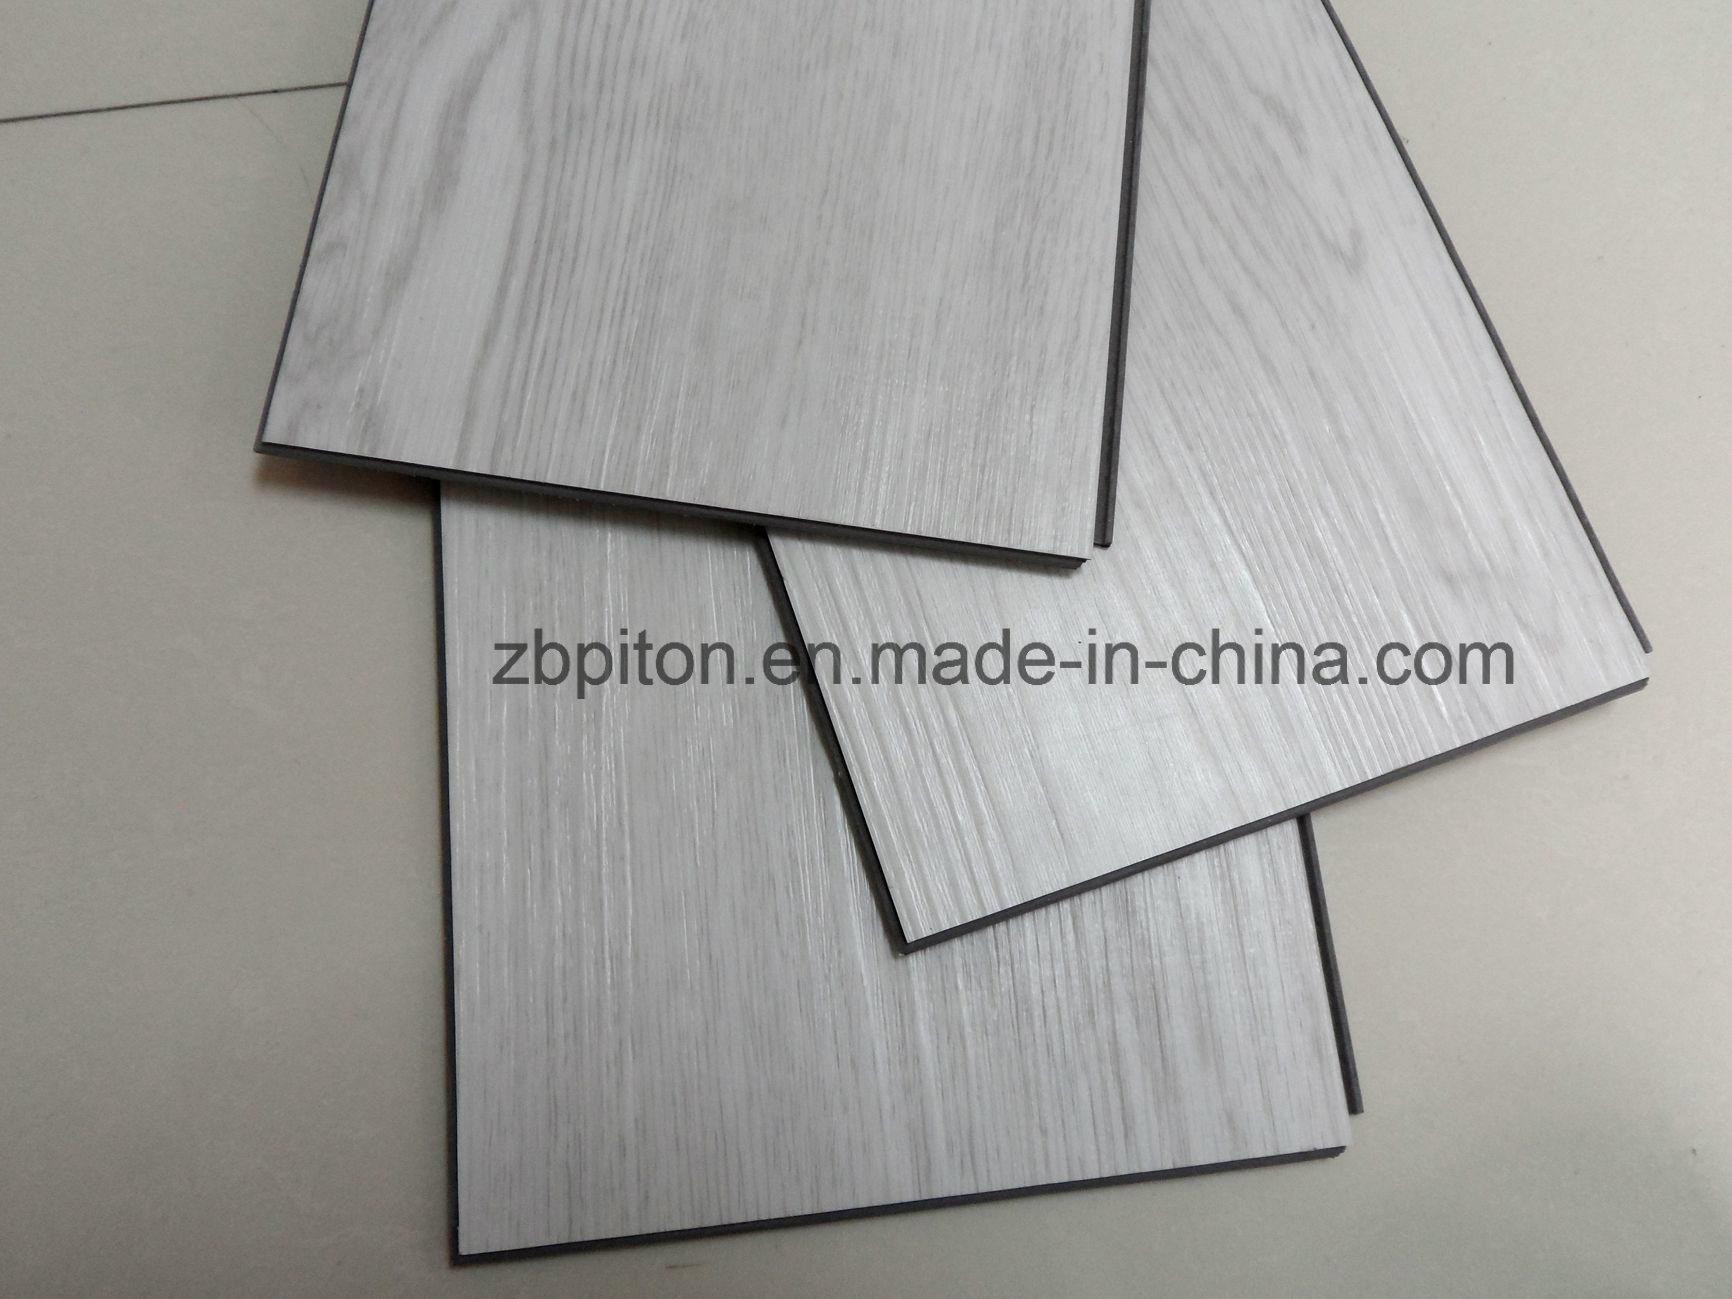 China interlocking plastic floor tile lvt pvc vinyl planks interlocking plastic floor tile lvt pvc vinyl planks cng0471n doublecrazyfo Images